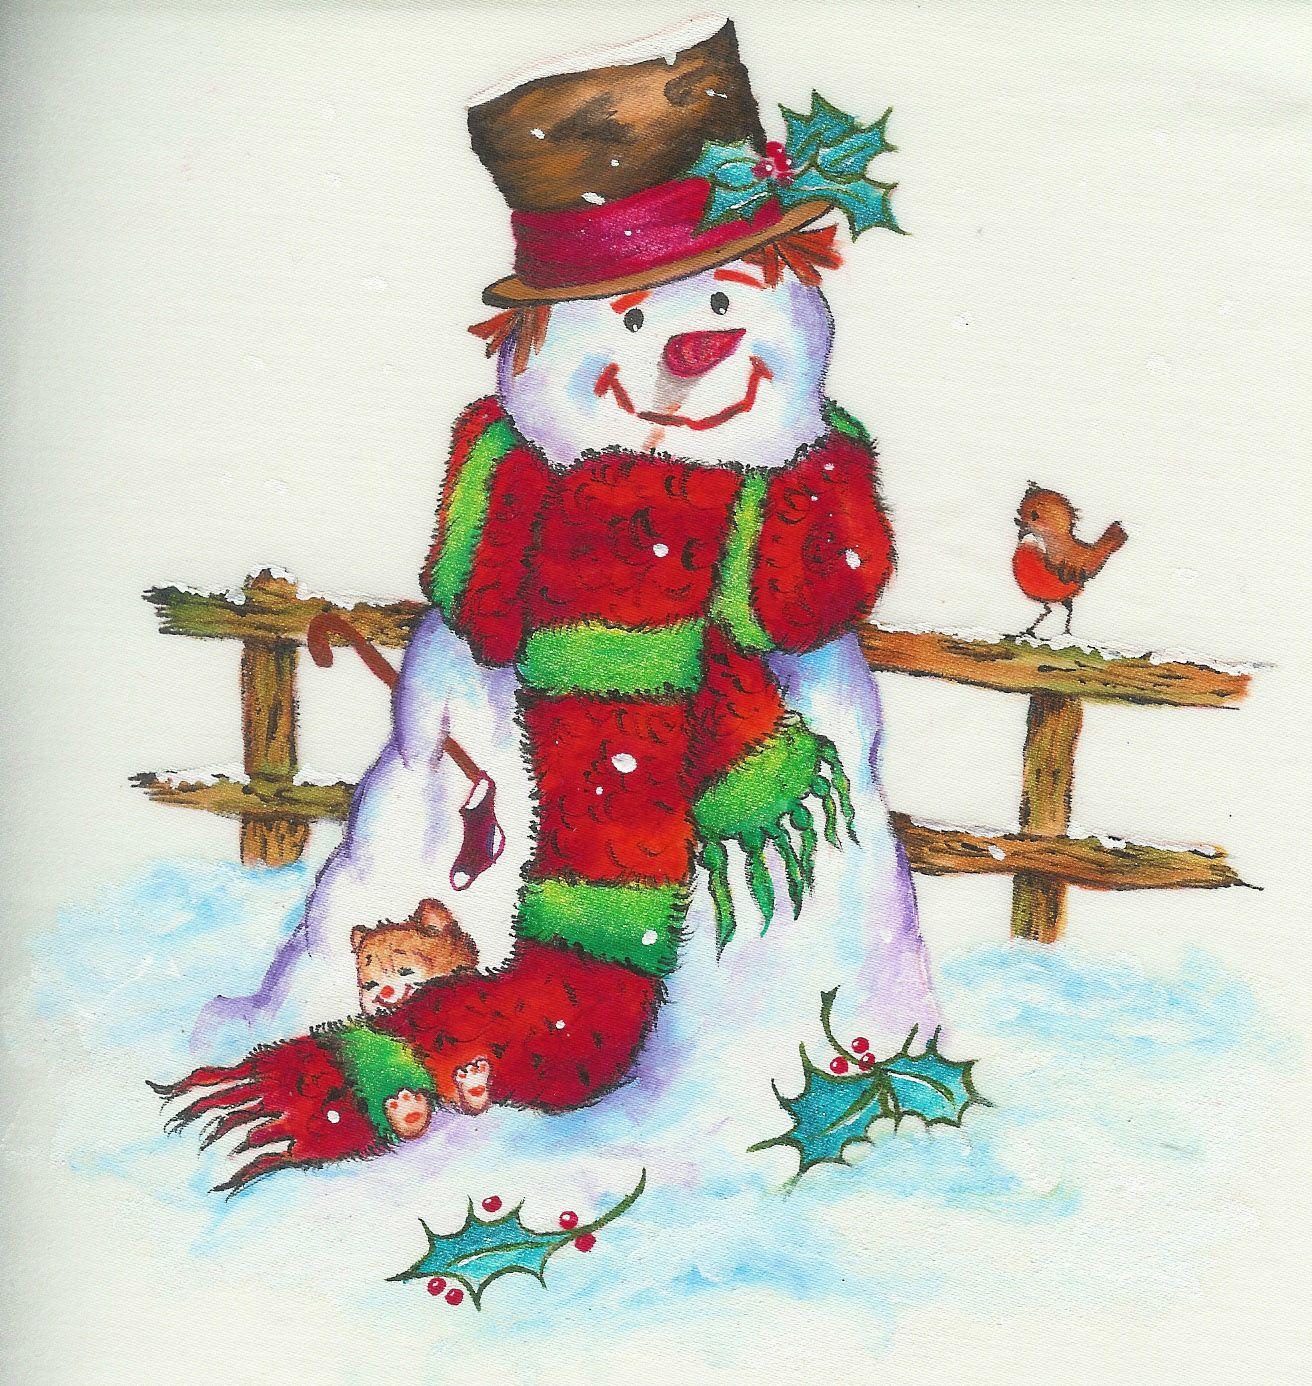 Pintura en tela navidad proyectos que intentar arte - Motivos navidenos para pintar en tela ...